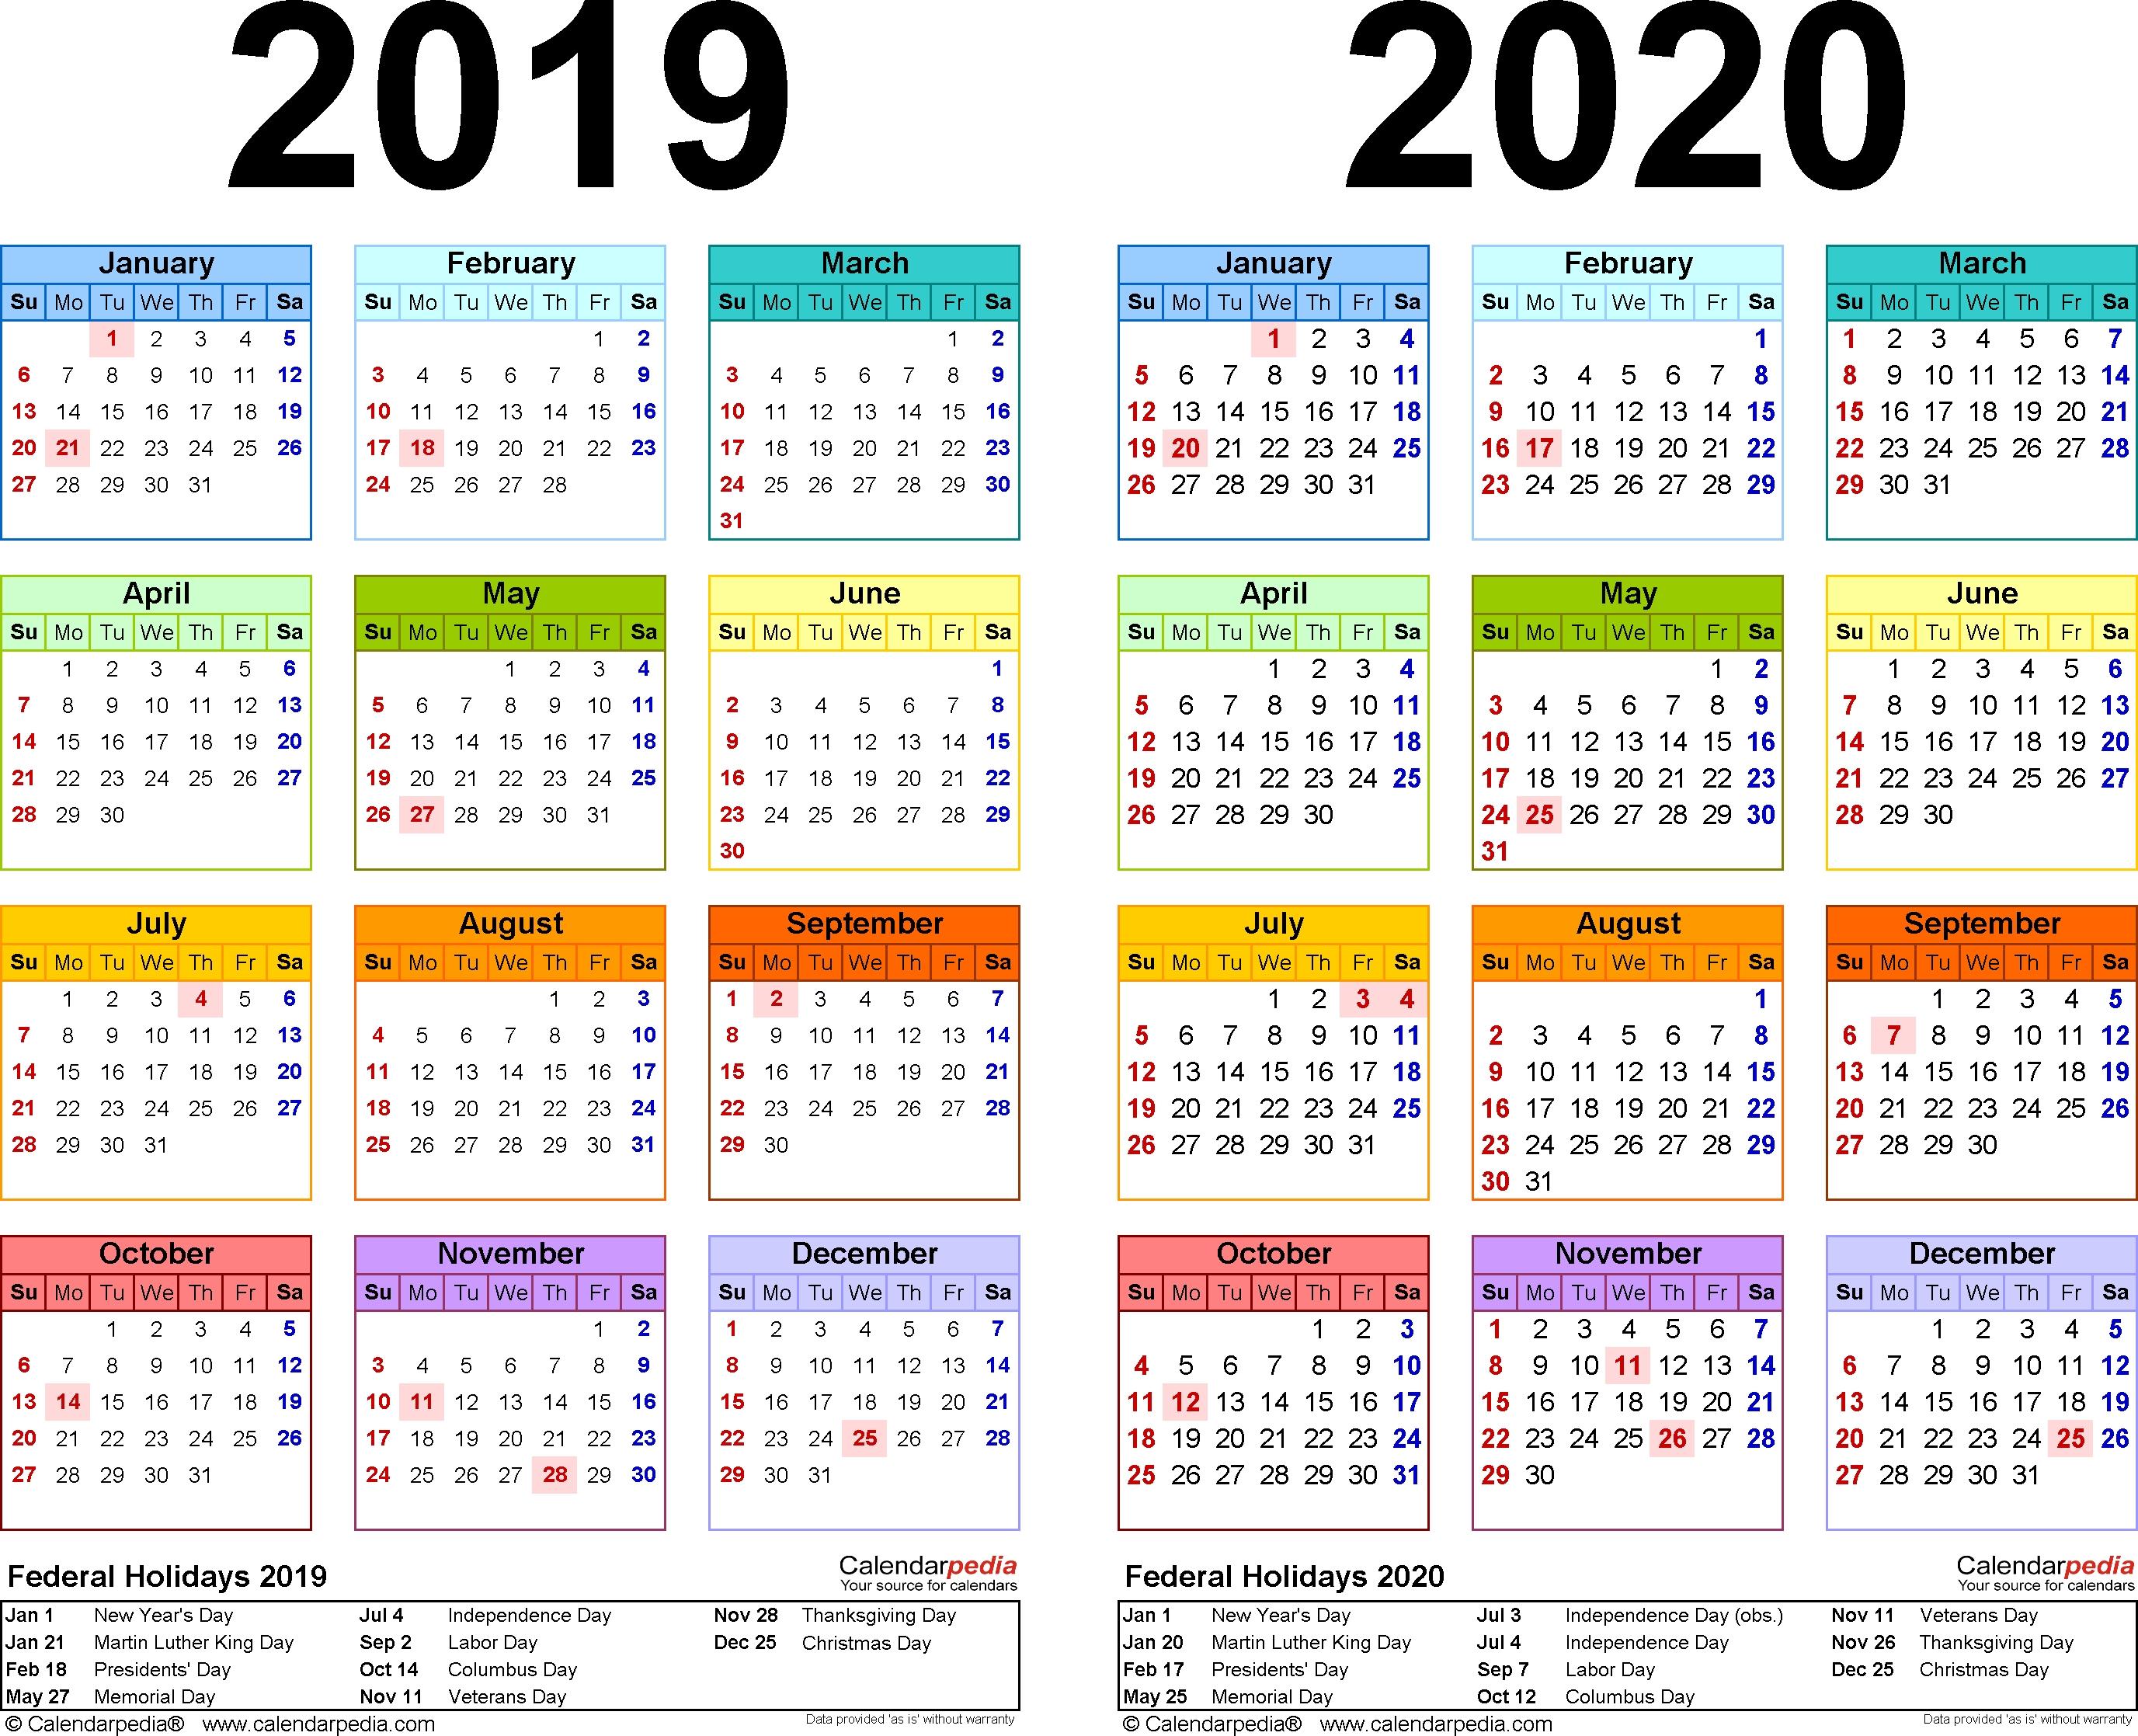 2019-2020 Calendar - Free Printable Two-Year Pdf Calendars_School Calendar For 2020-18